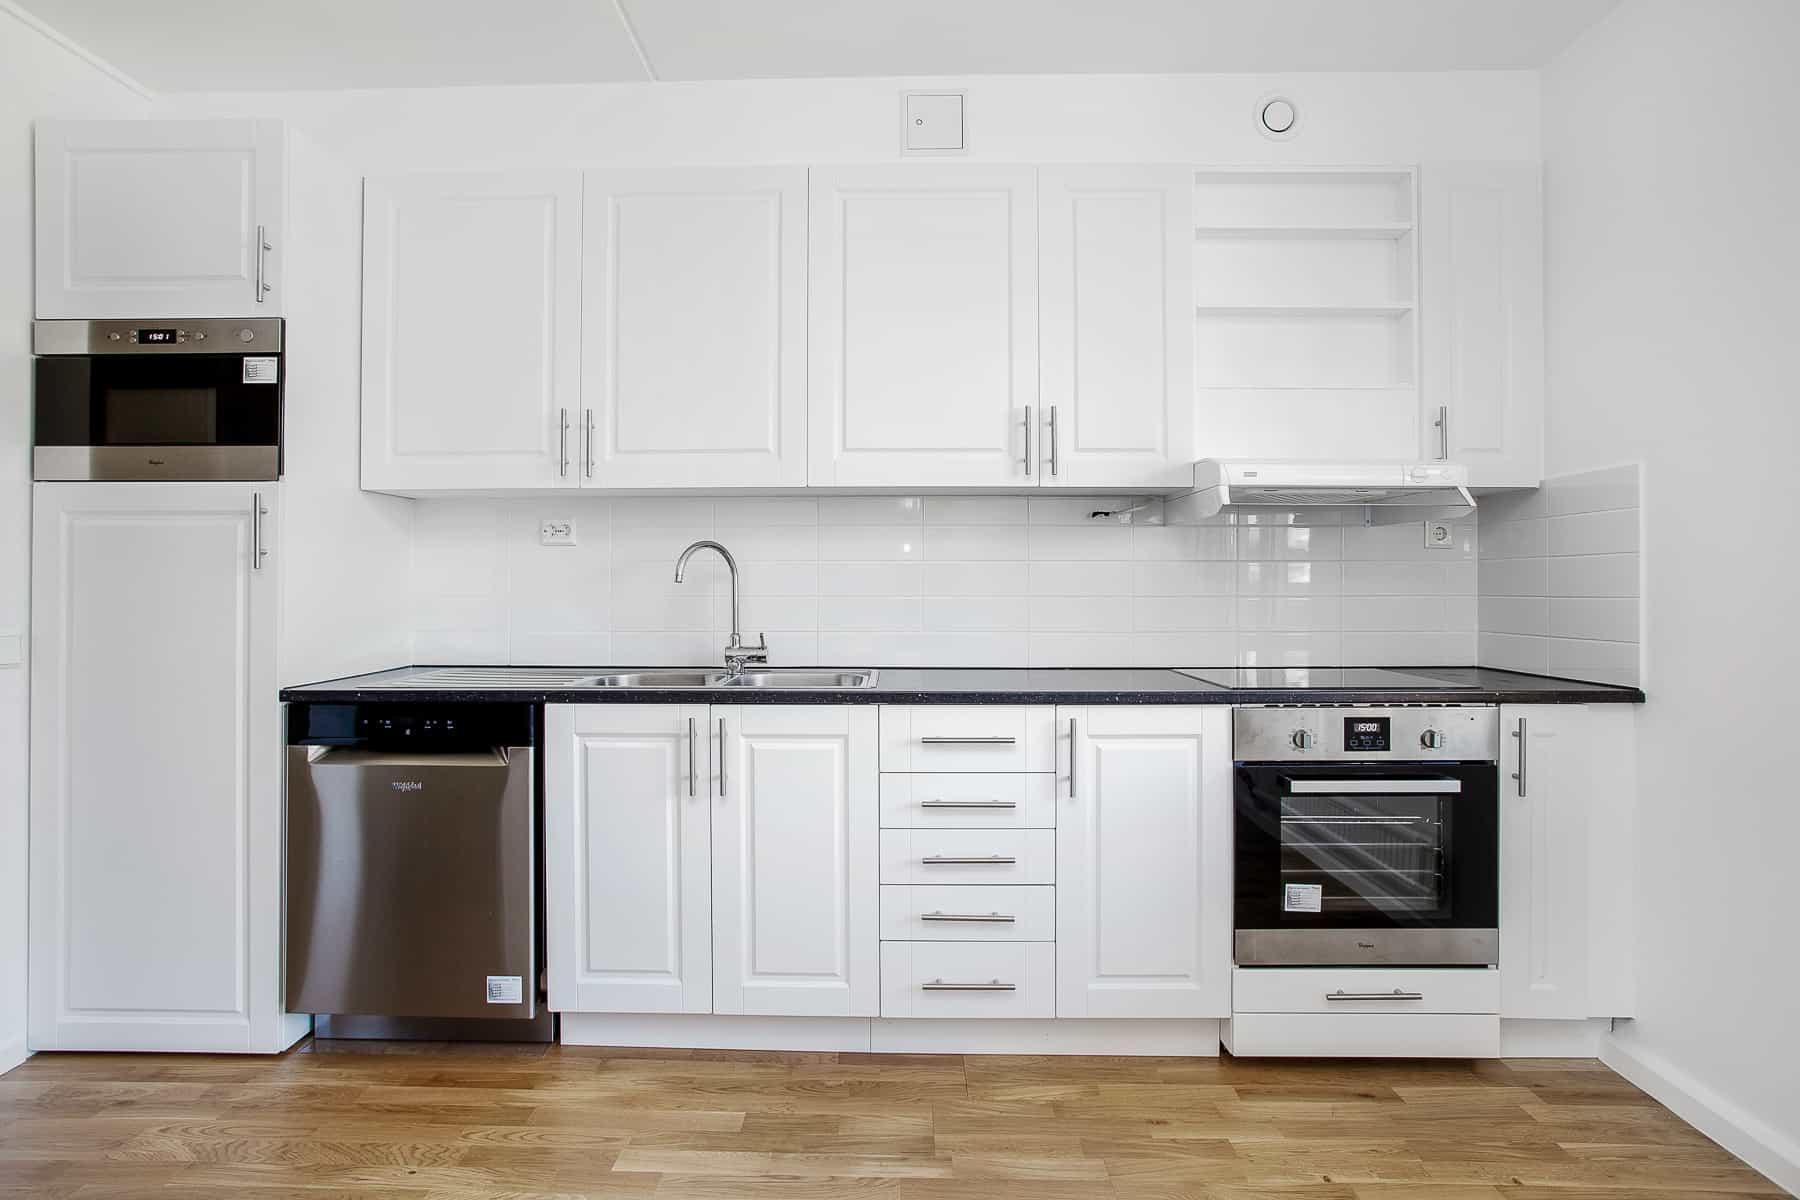 "Referensjobb ""Lägenhetsrenovering"" utfört av Sands Entreprenad Stockholm AB"